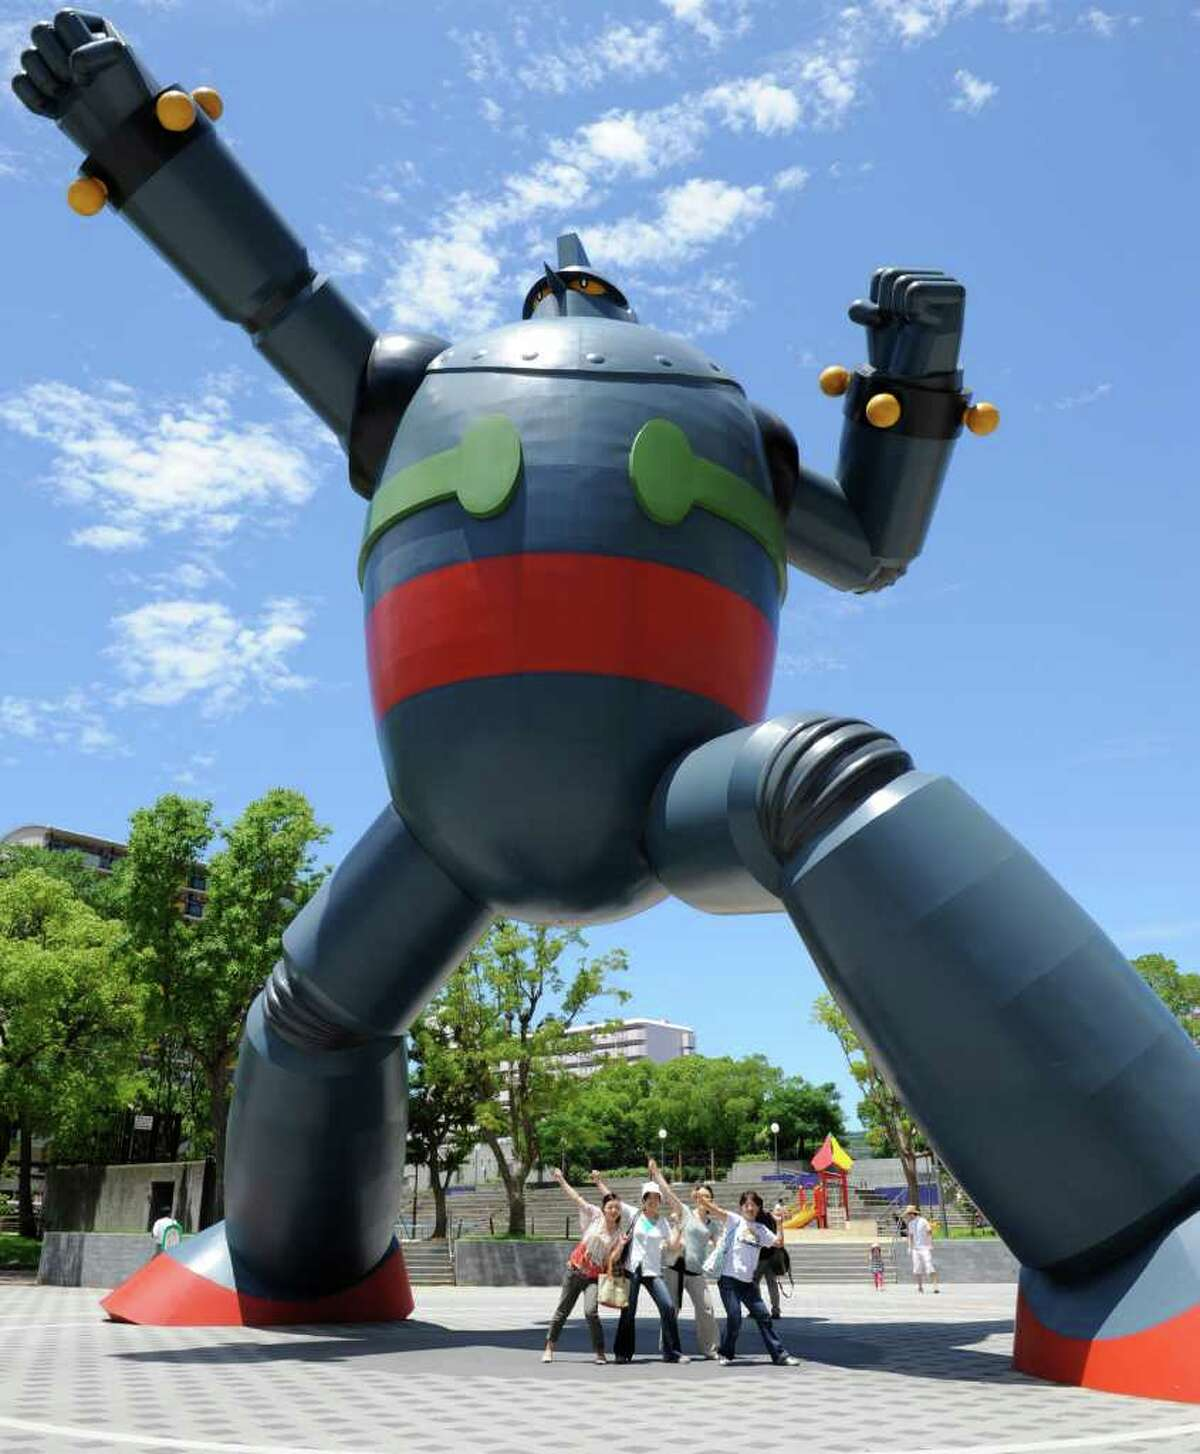 Tourists pose with a 15.3 metre-tall 'Tetsujin 28-go', or 'Iron Man 28' at Wakamatsu park in Kobe, Japan. The statue was built to commemorate its manga creator, Mitsuteru Yokoyama who born in Kobe.